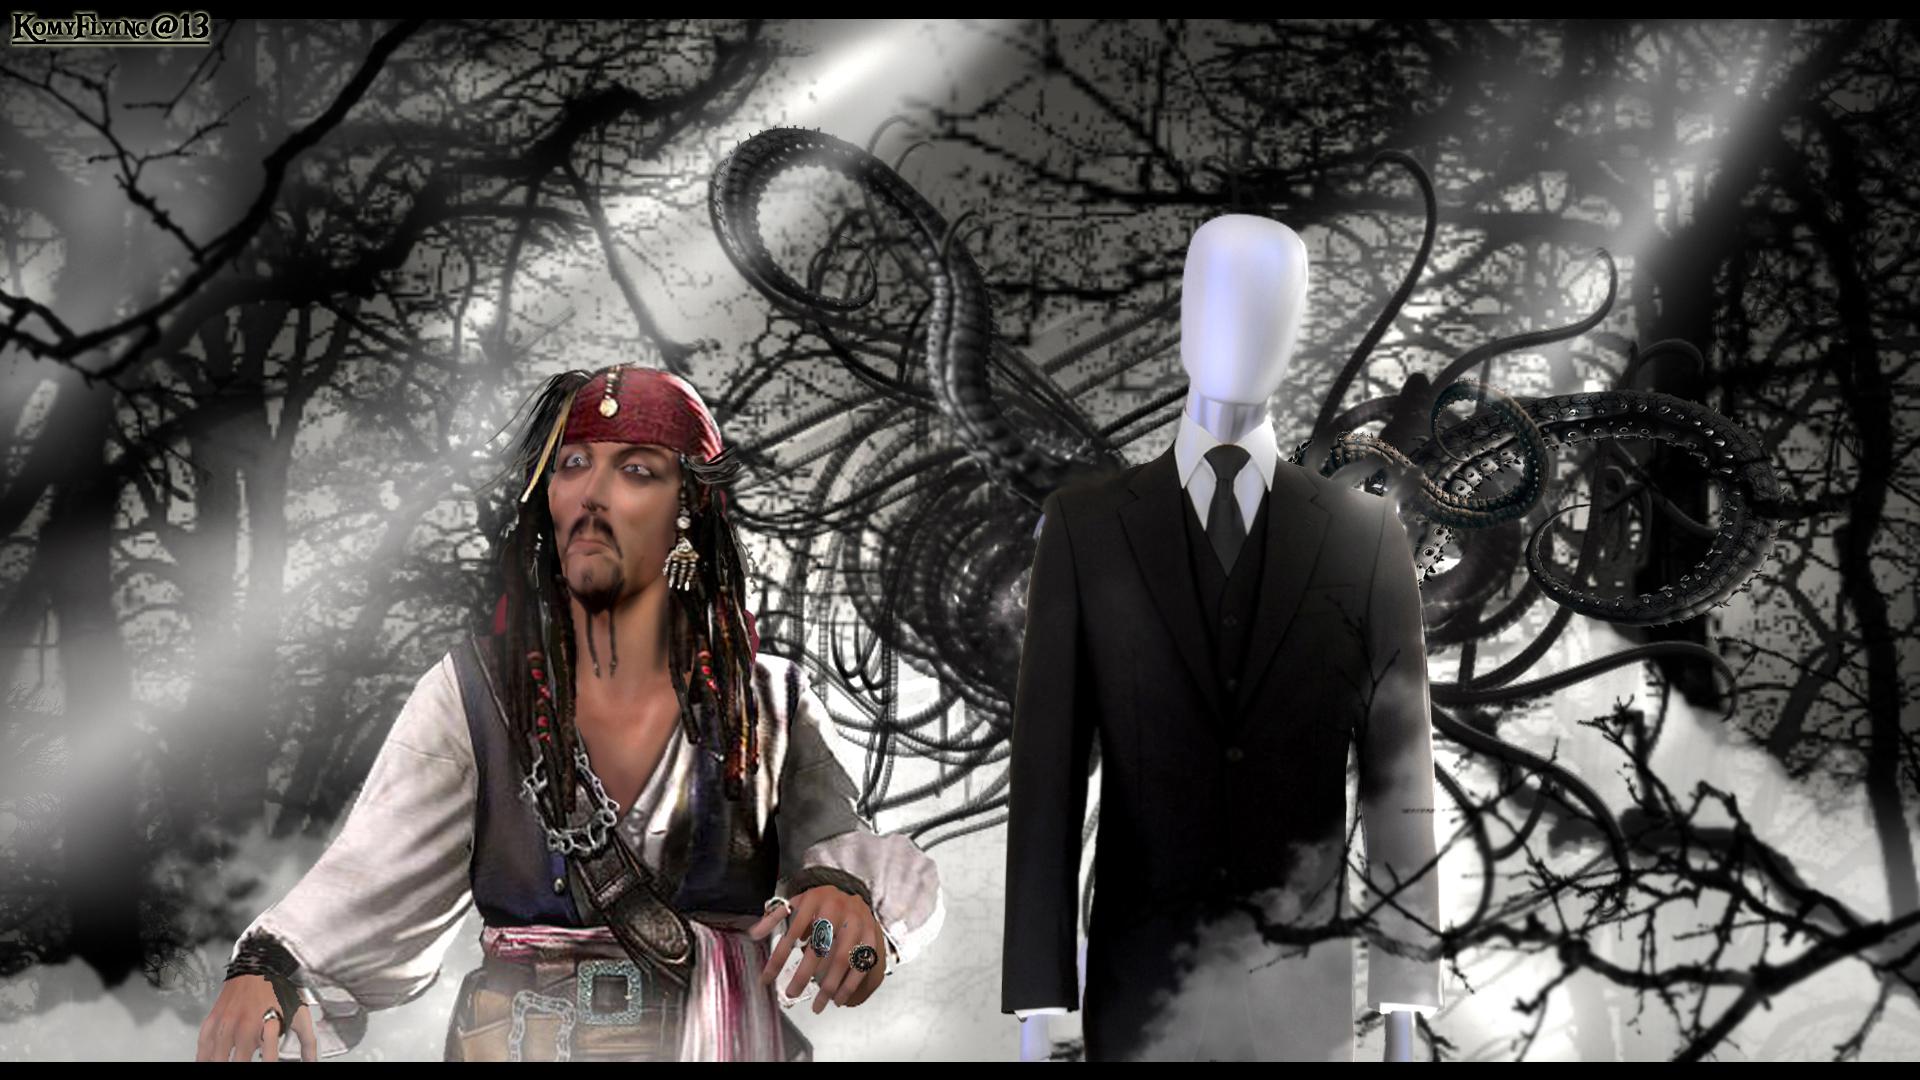 Jack Sparrow Meet The Slender Man By Komyfly On Deviantart